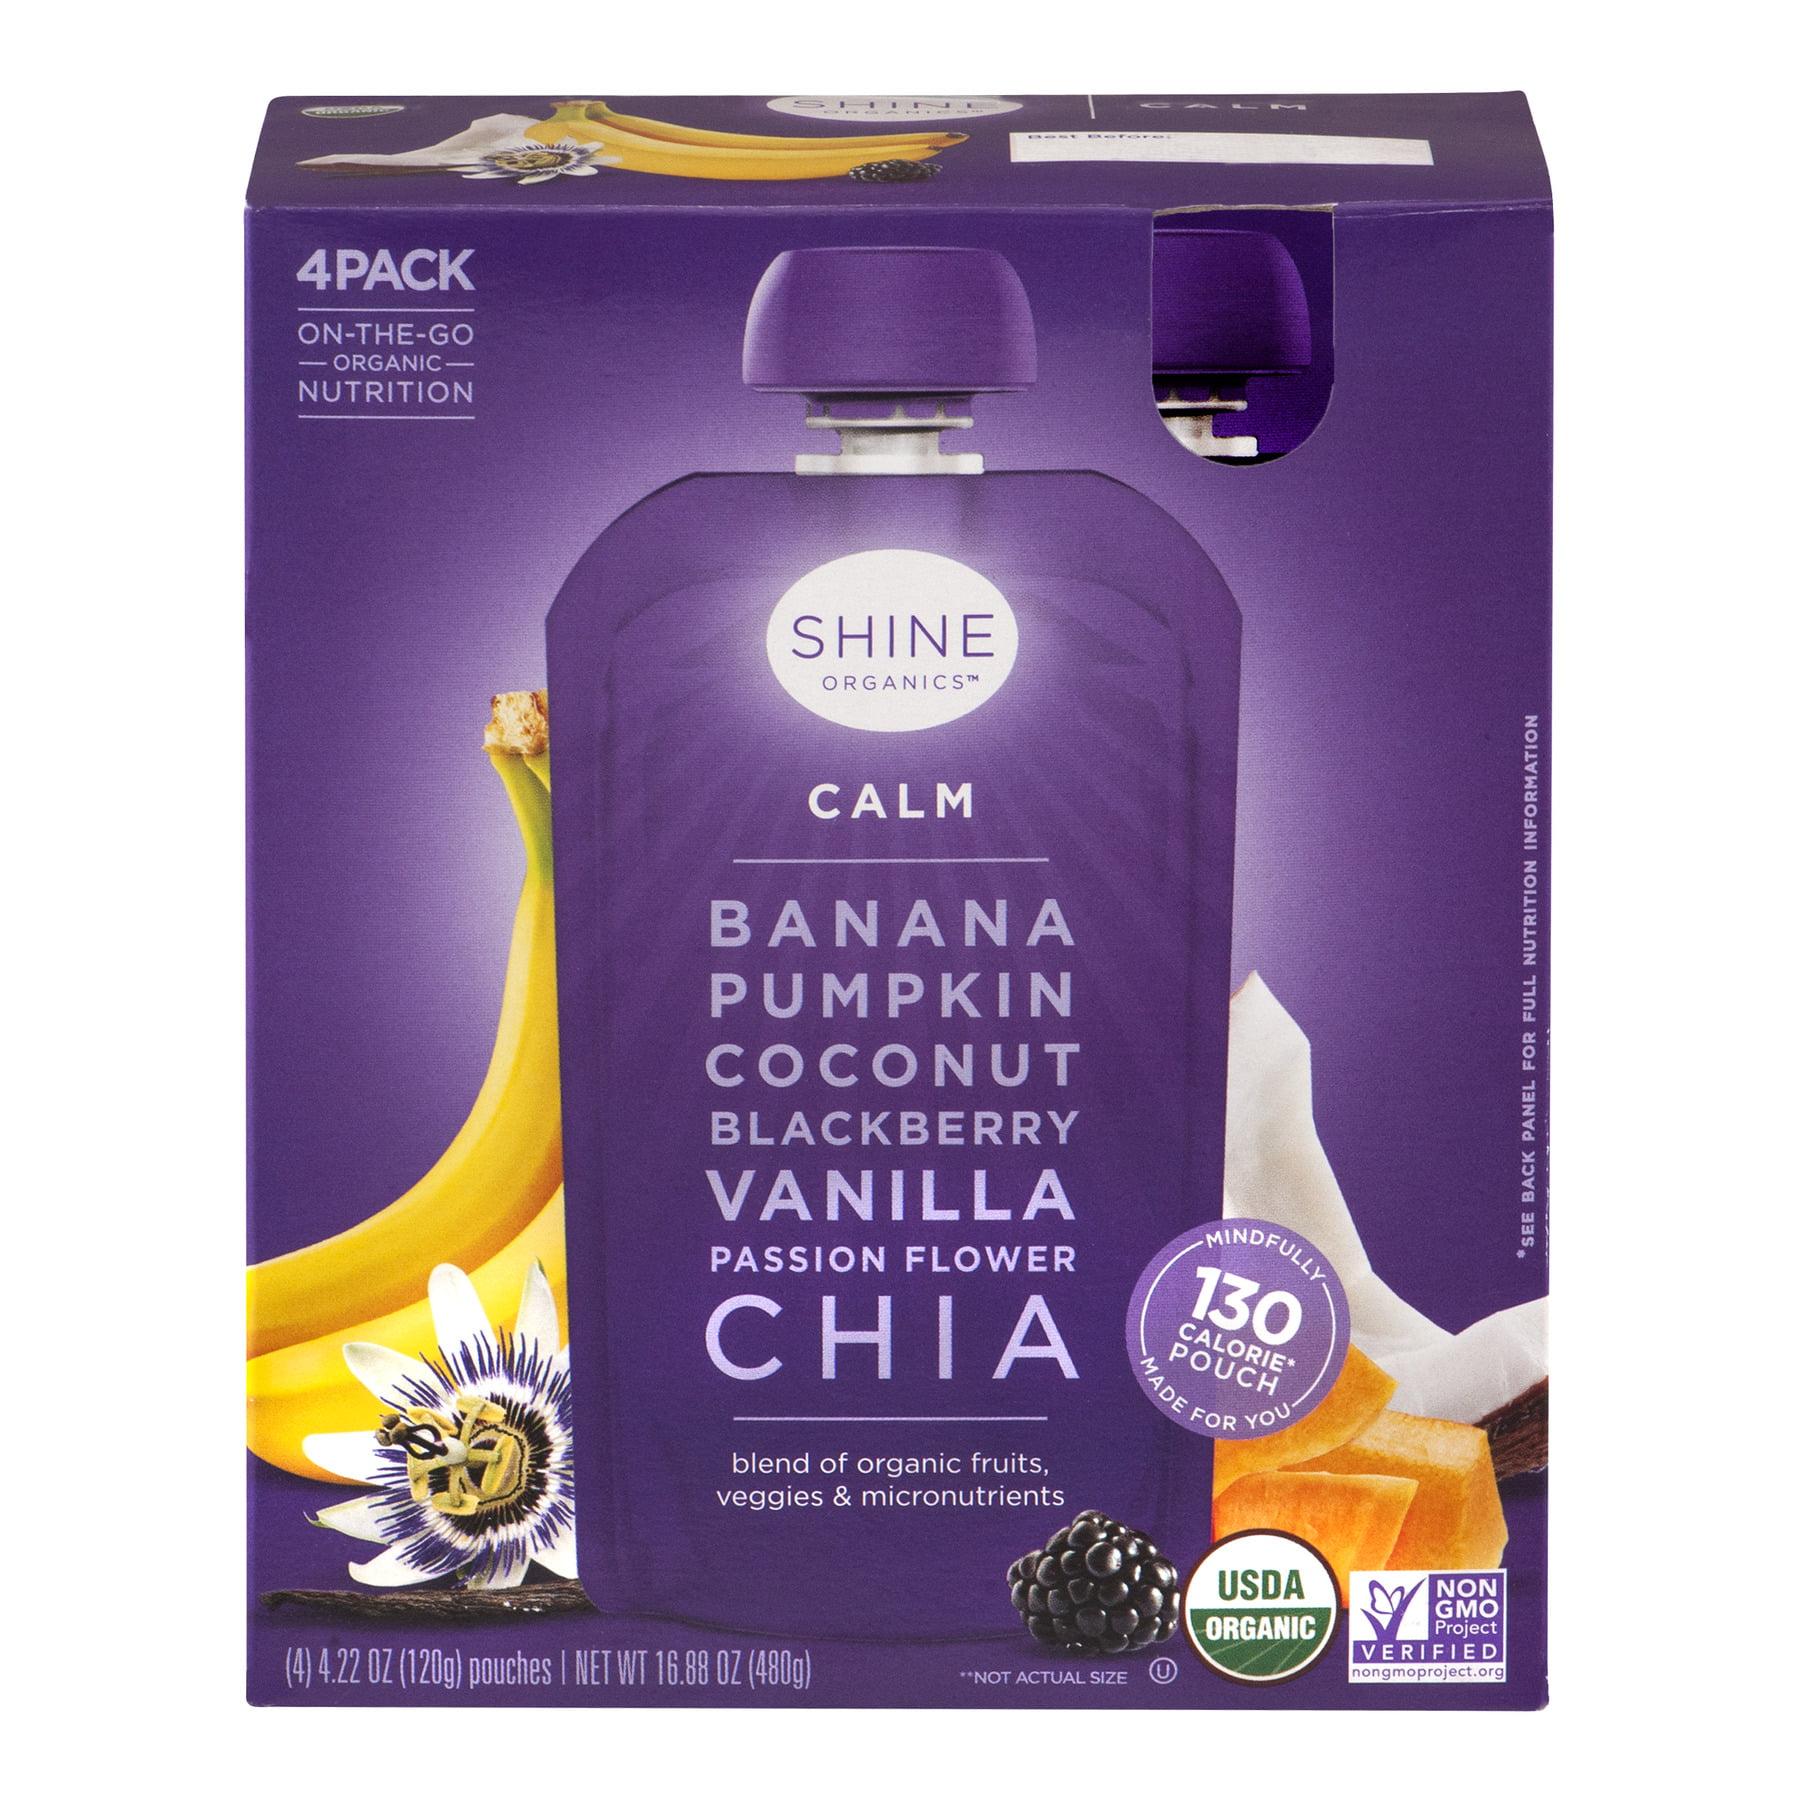 Shine Organics Fruit & Vegetable Juice, Calm, 4.22 Fl Oz, 4 Count